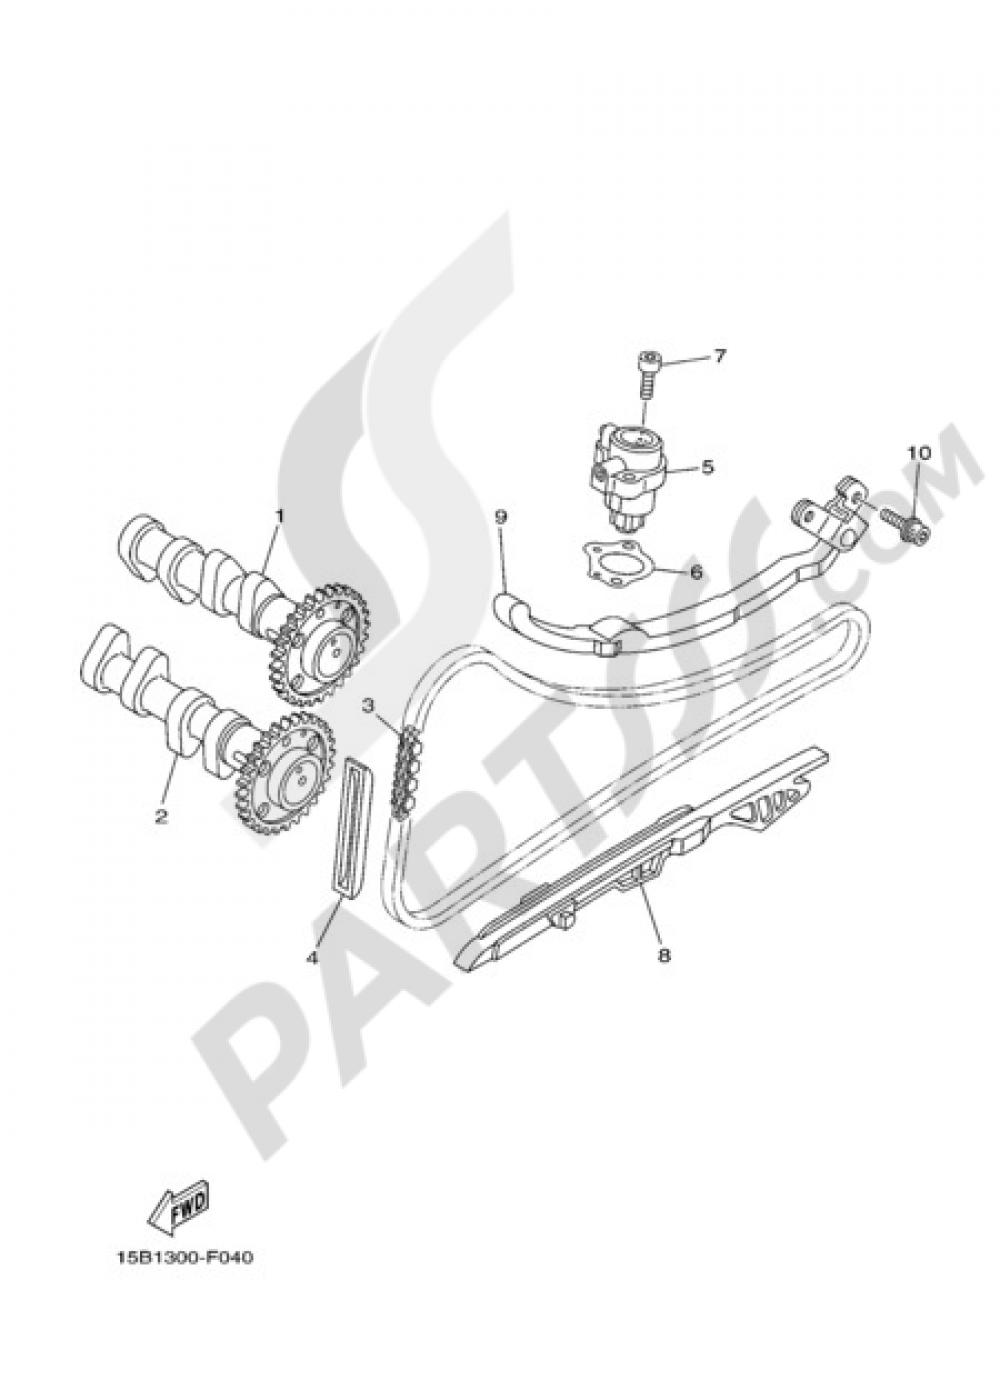 CAMSHAFT & CHAIN Yamaha T-Max 2009